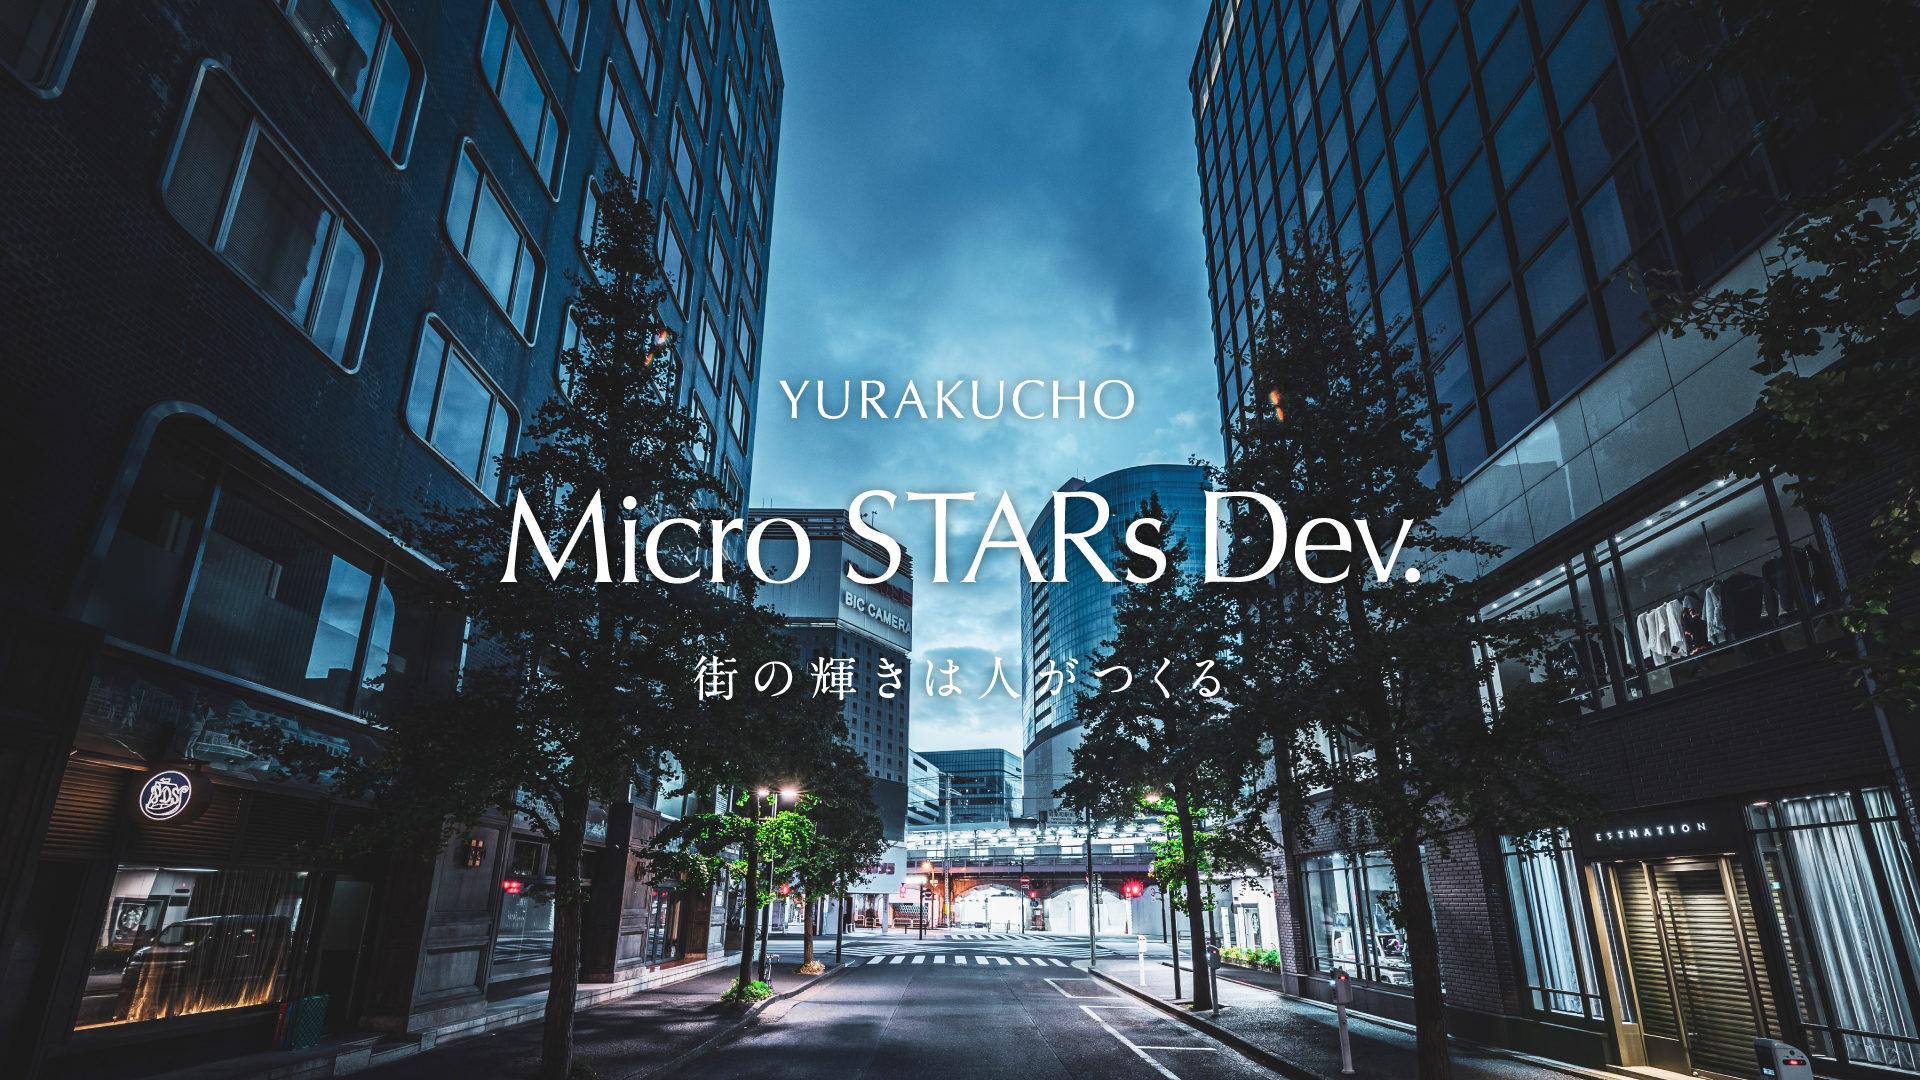 Micro STARs Dev.